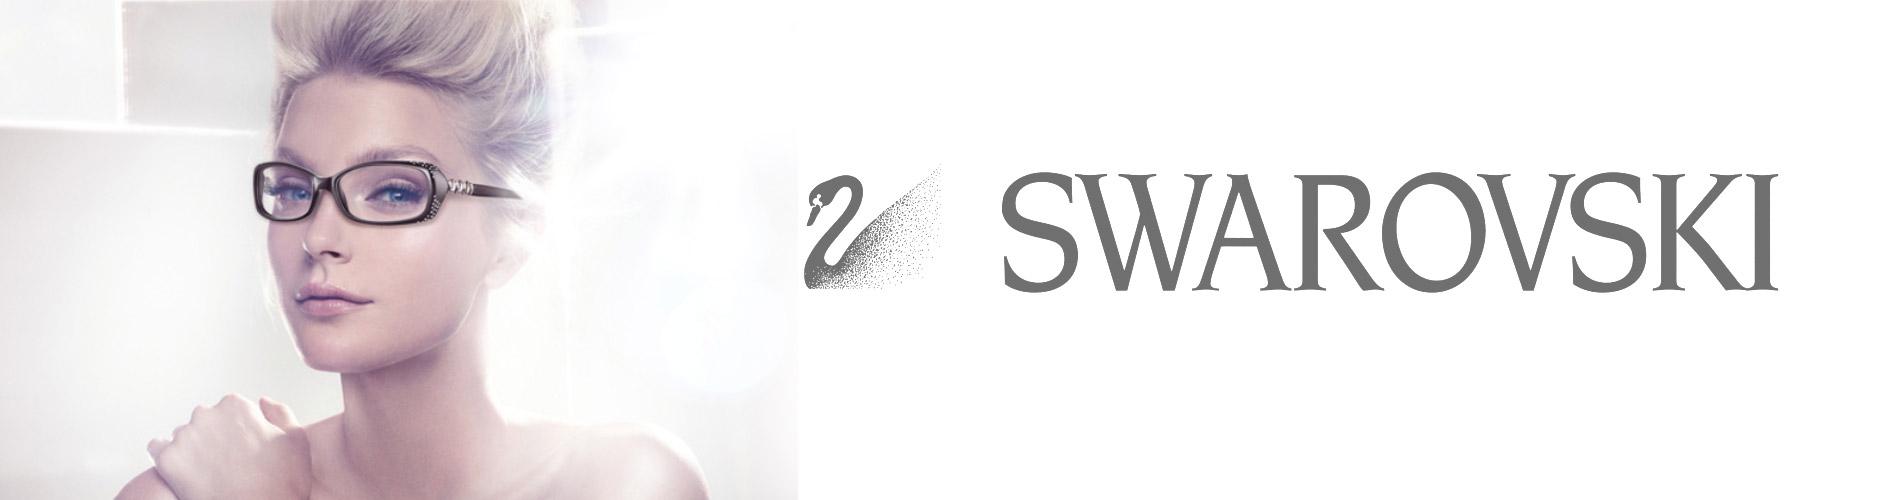 swarovski_glasses_1900px_500px